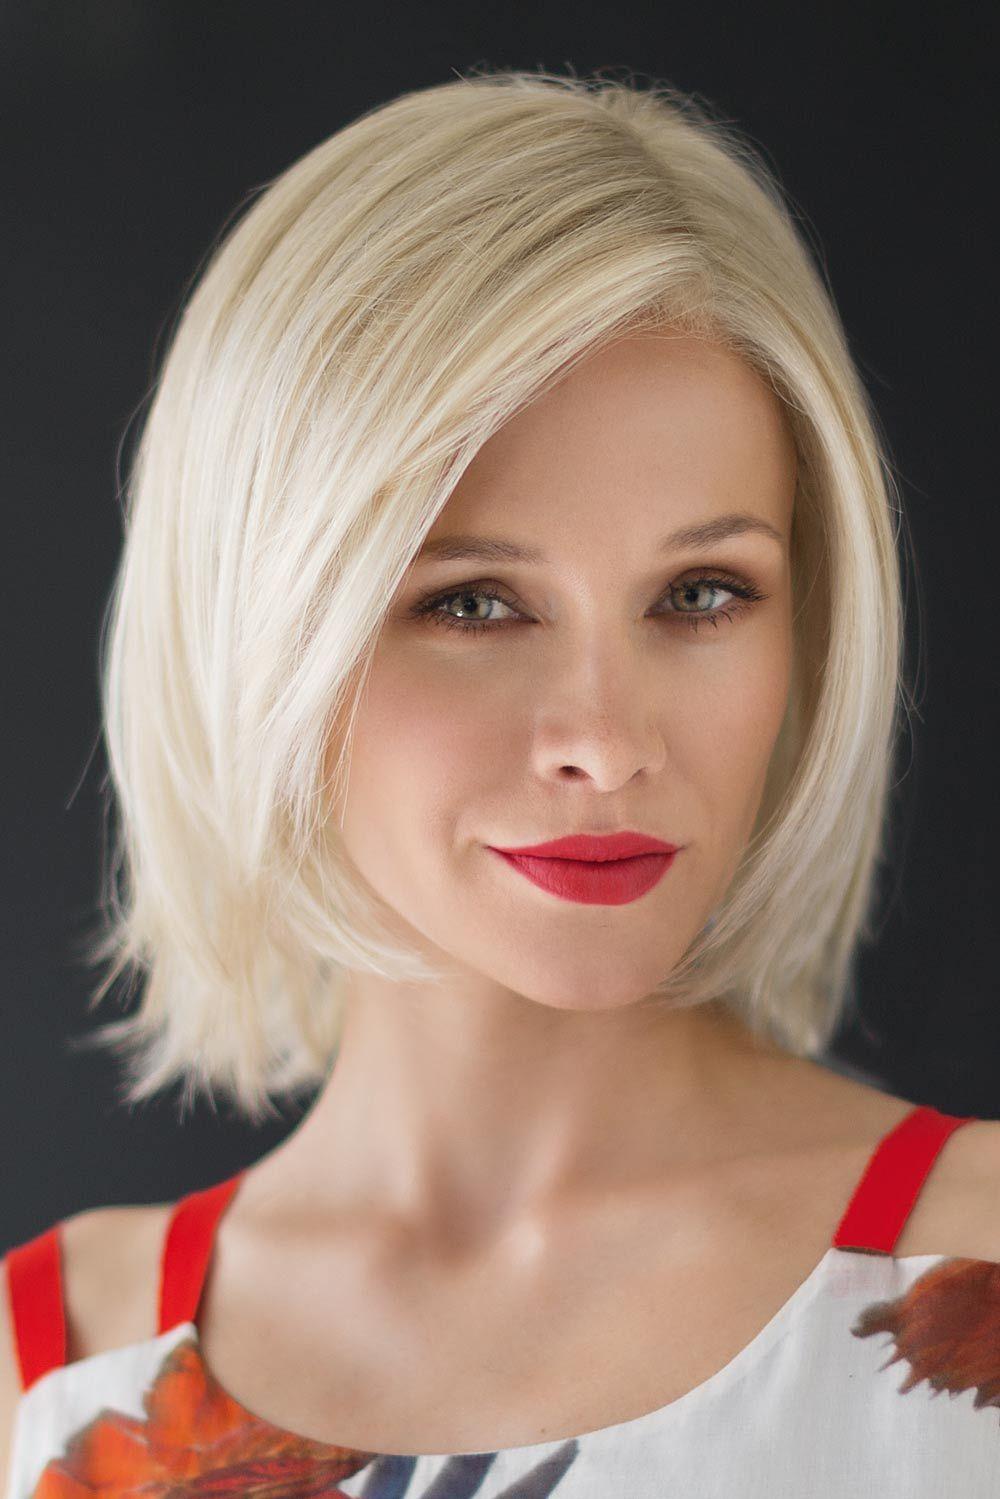 United by Ellen Wille Wigs - Pastel Blonde wig color